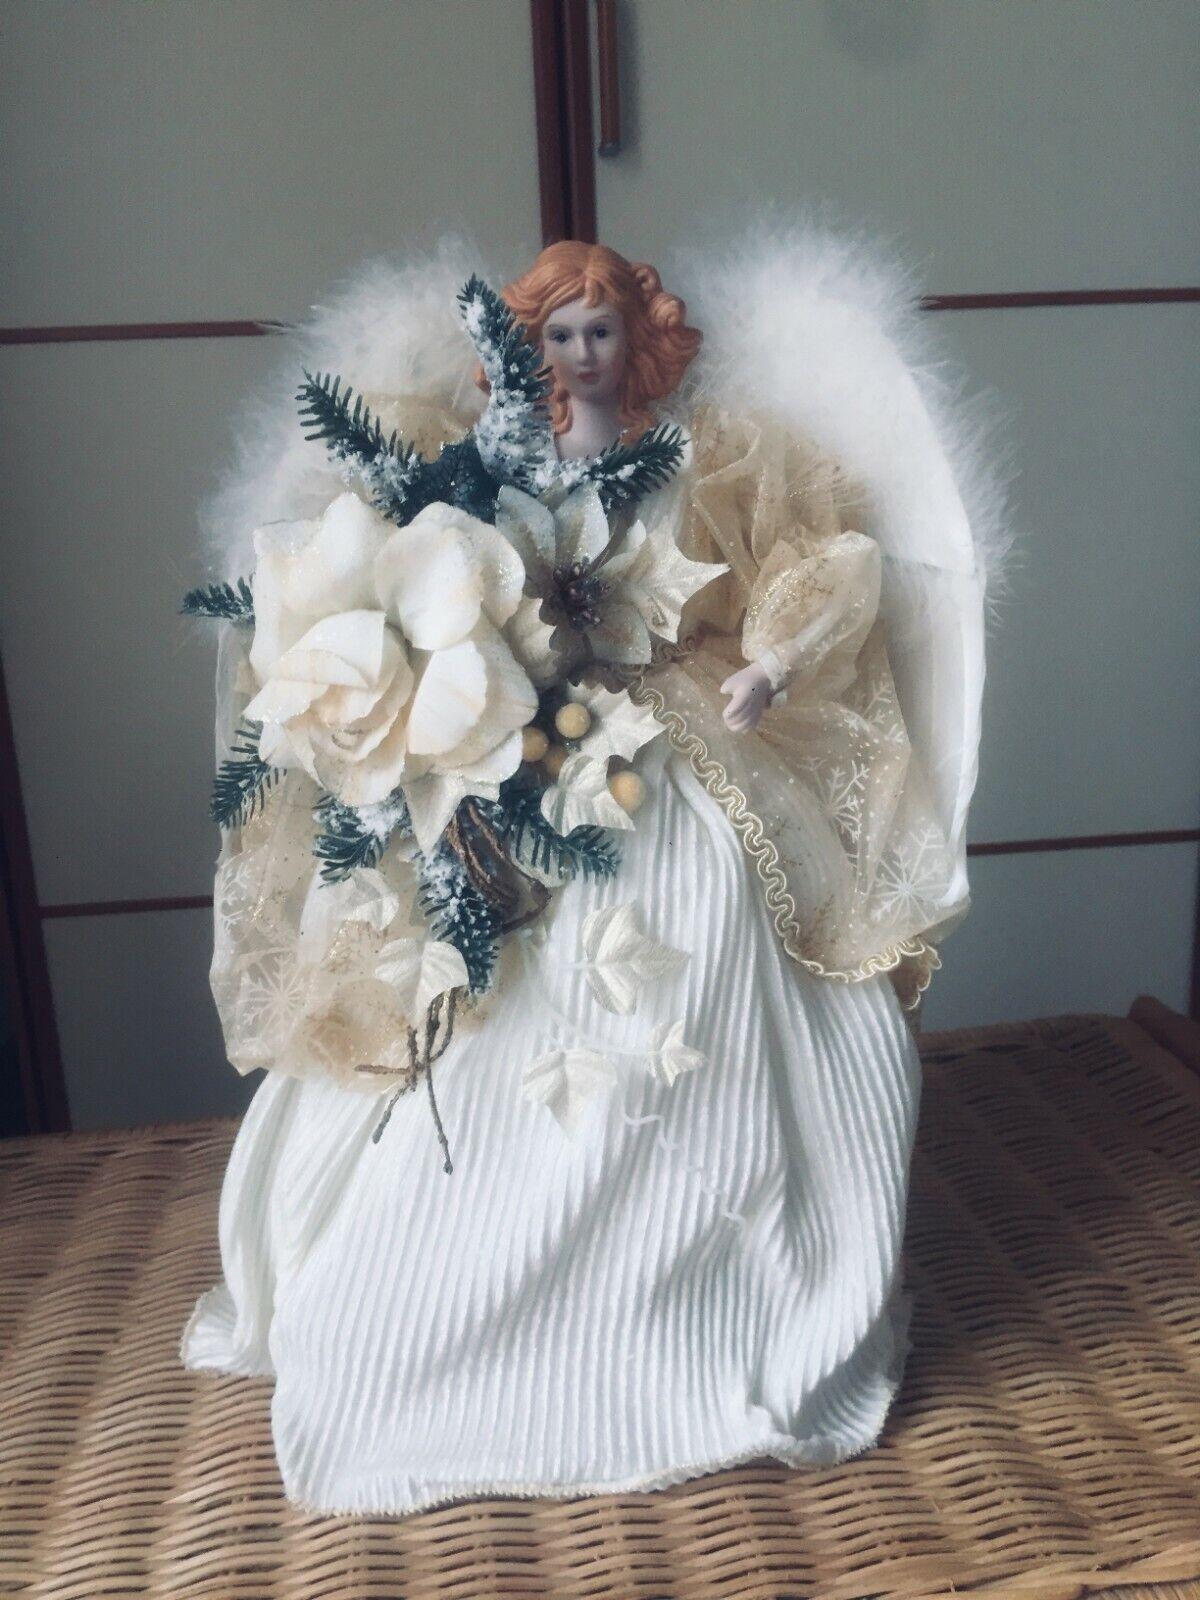 Hervit bambola bambola bambola angelo di porcellana da collezione 07a2e1